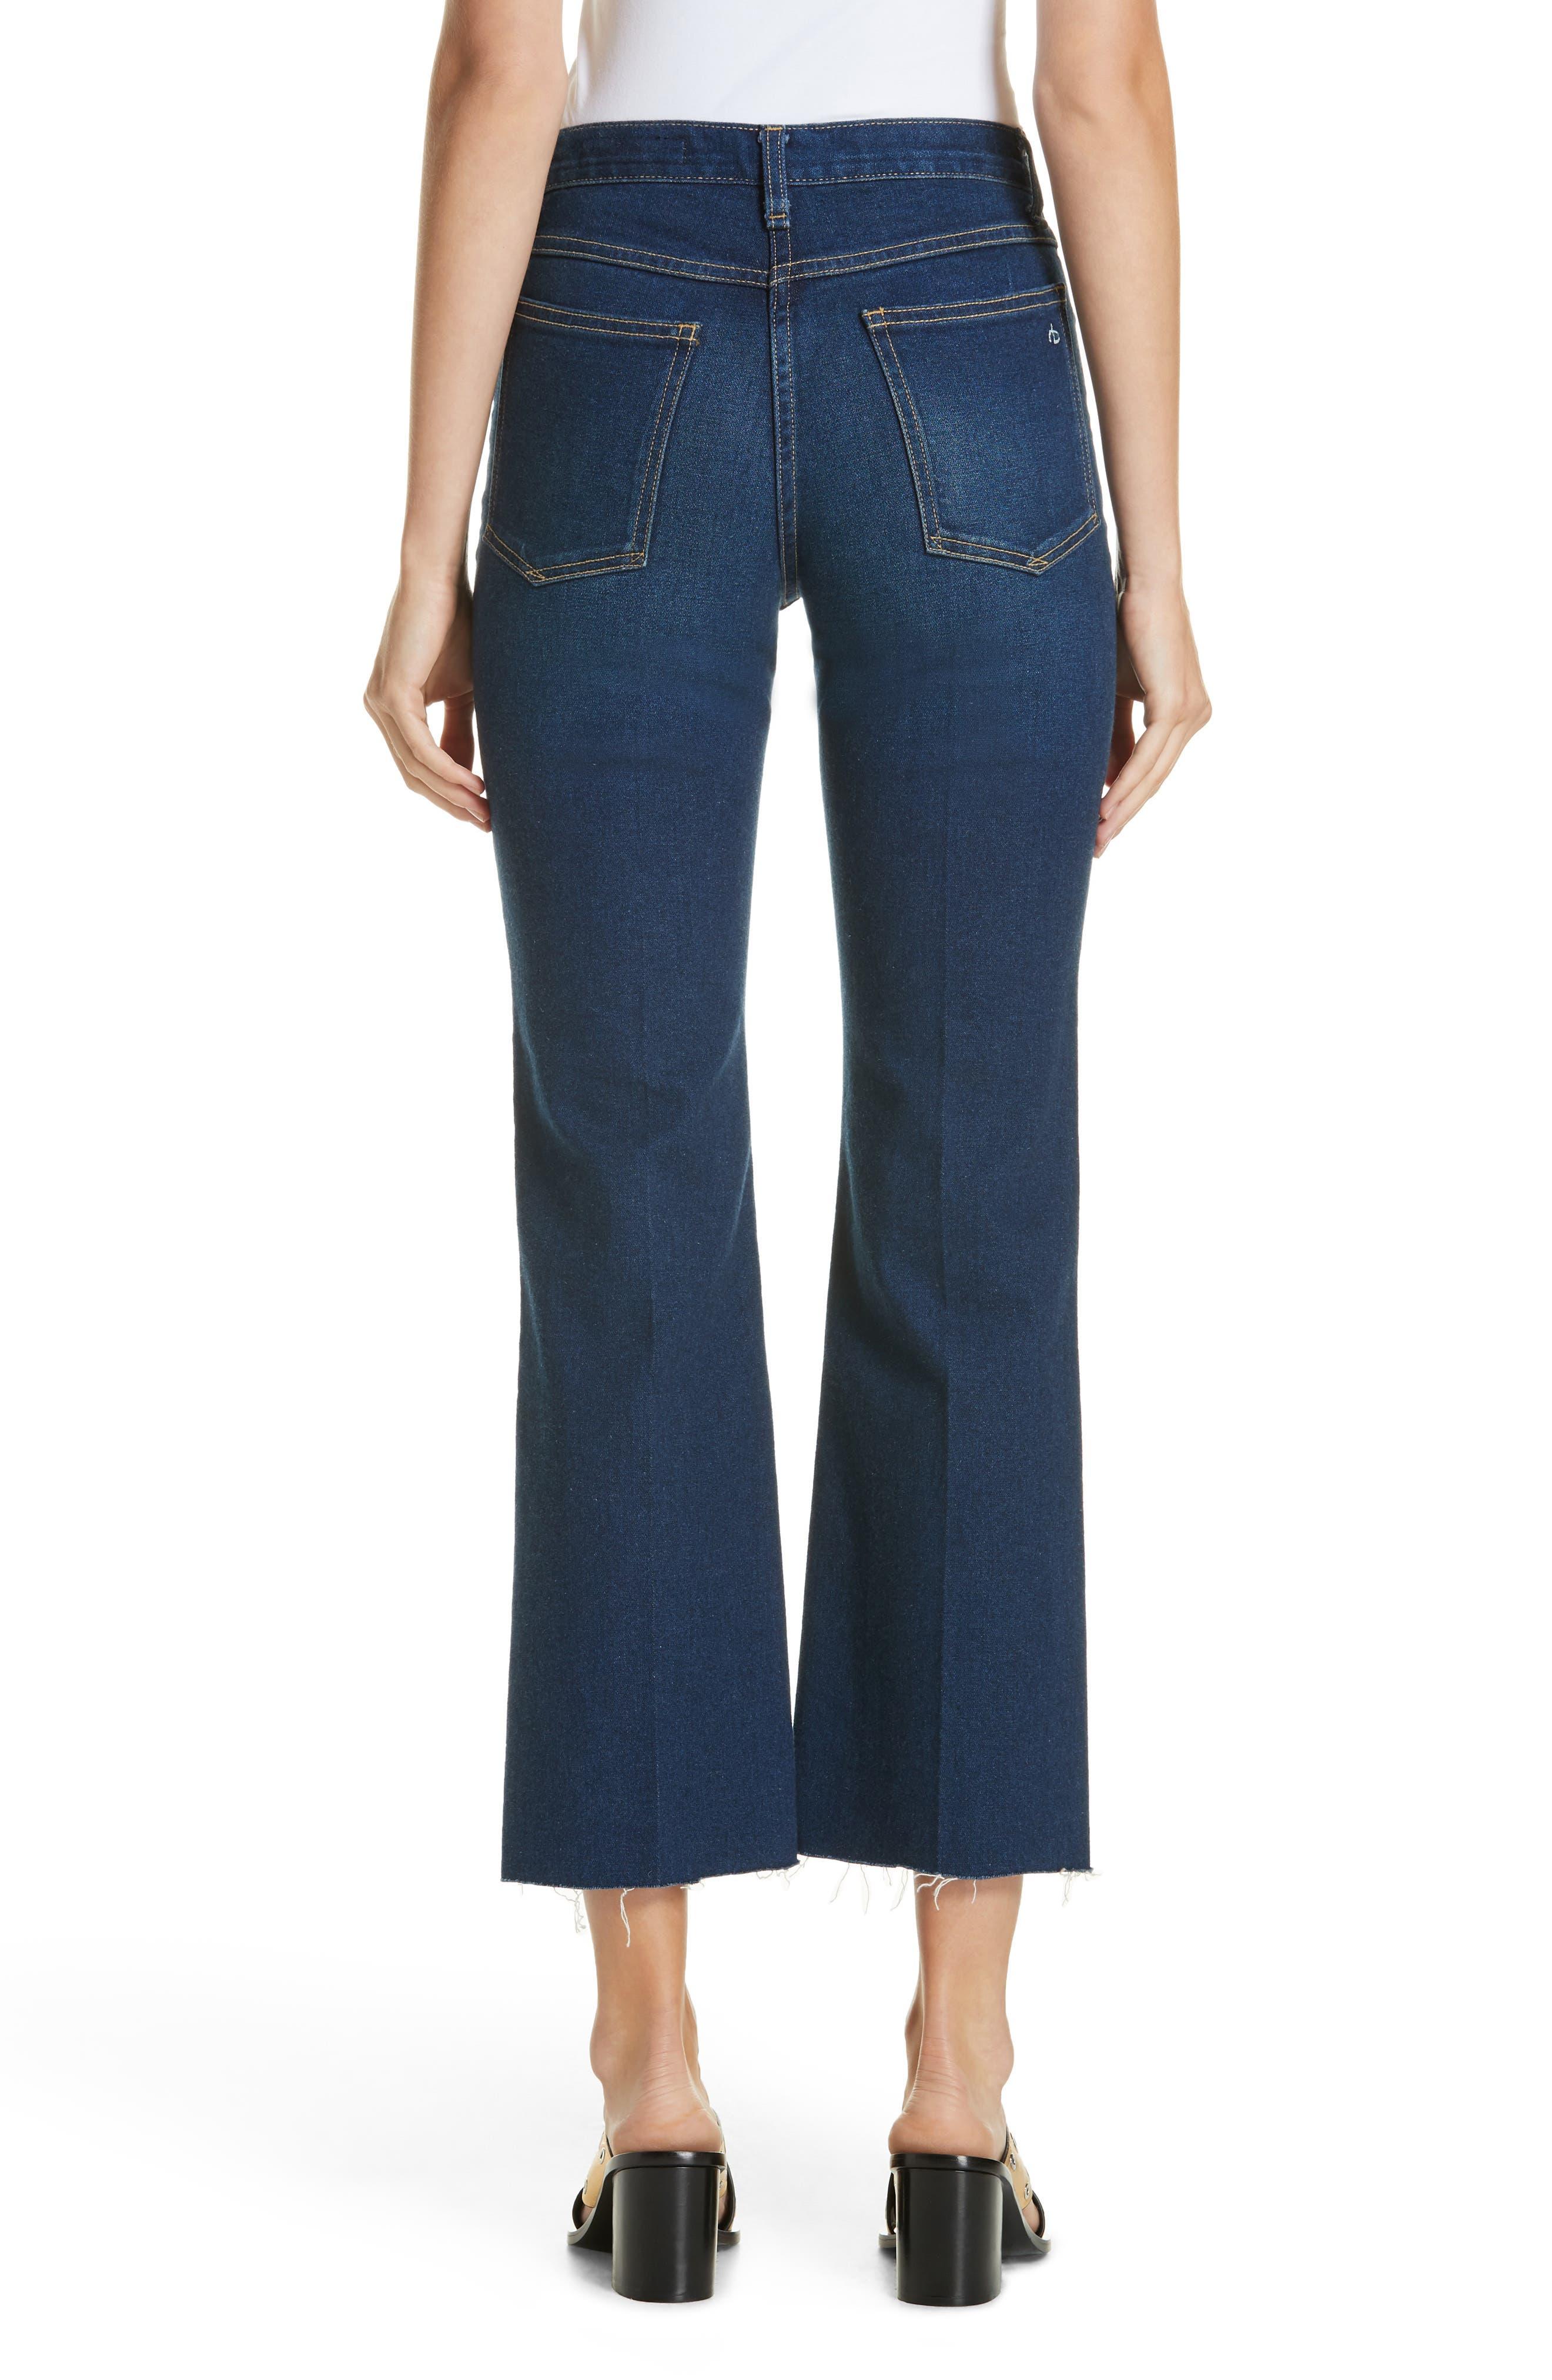 RAG & BONE,                             Justine High Waist Crop Wide Leg Jeans,                             Alternate thumbnail 2, color,                             410